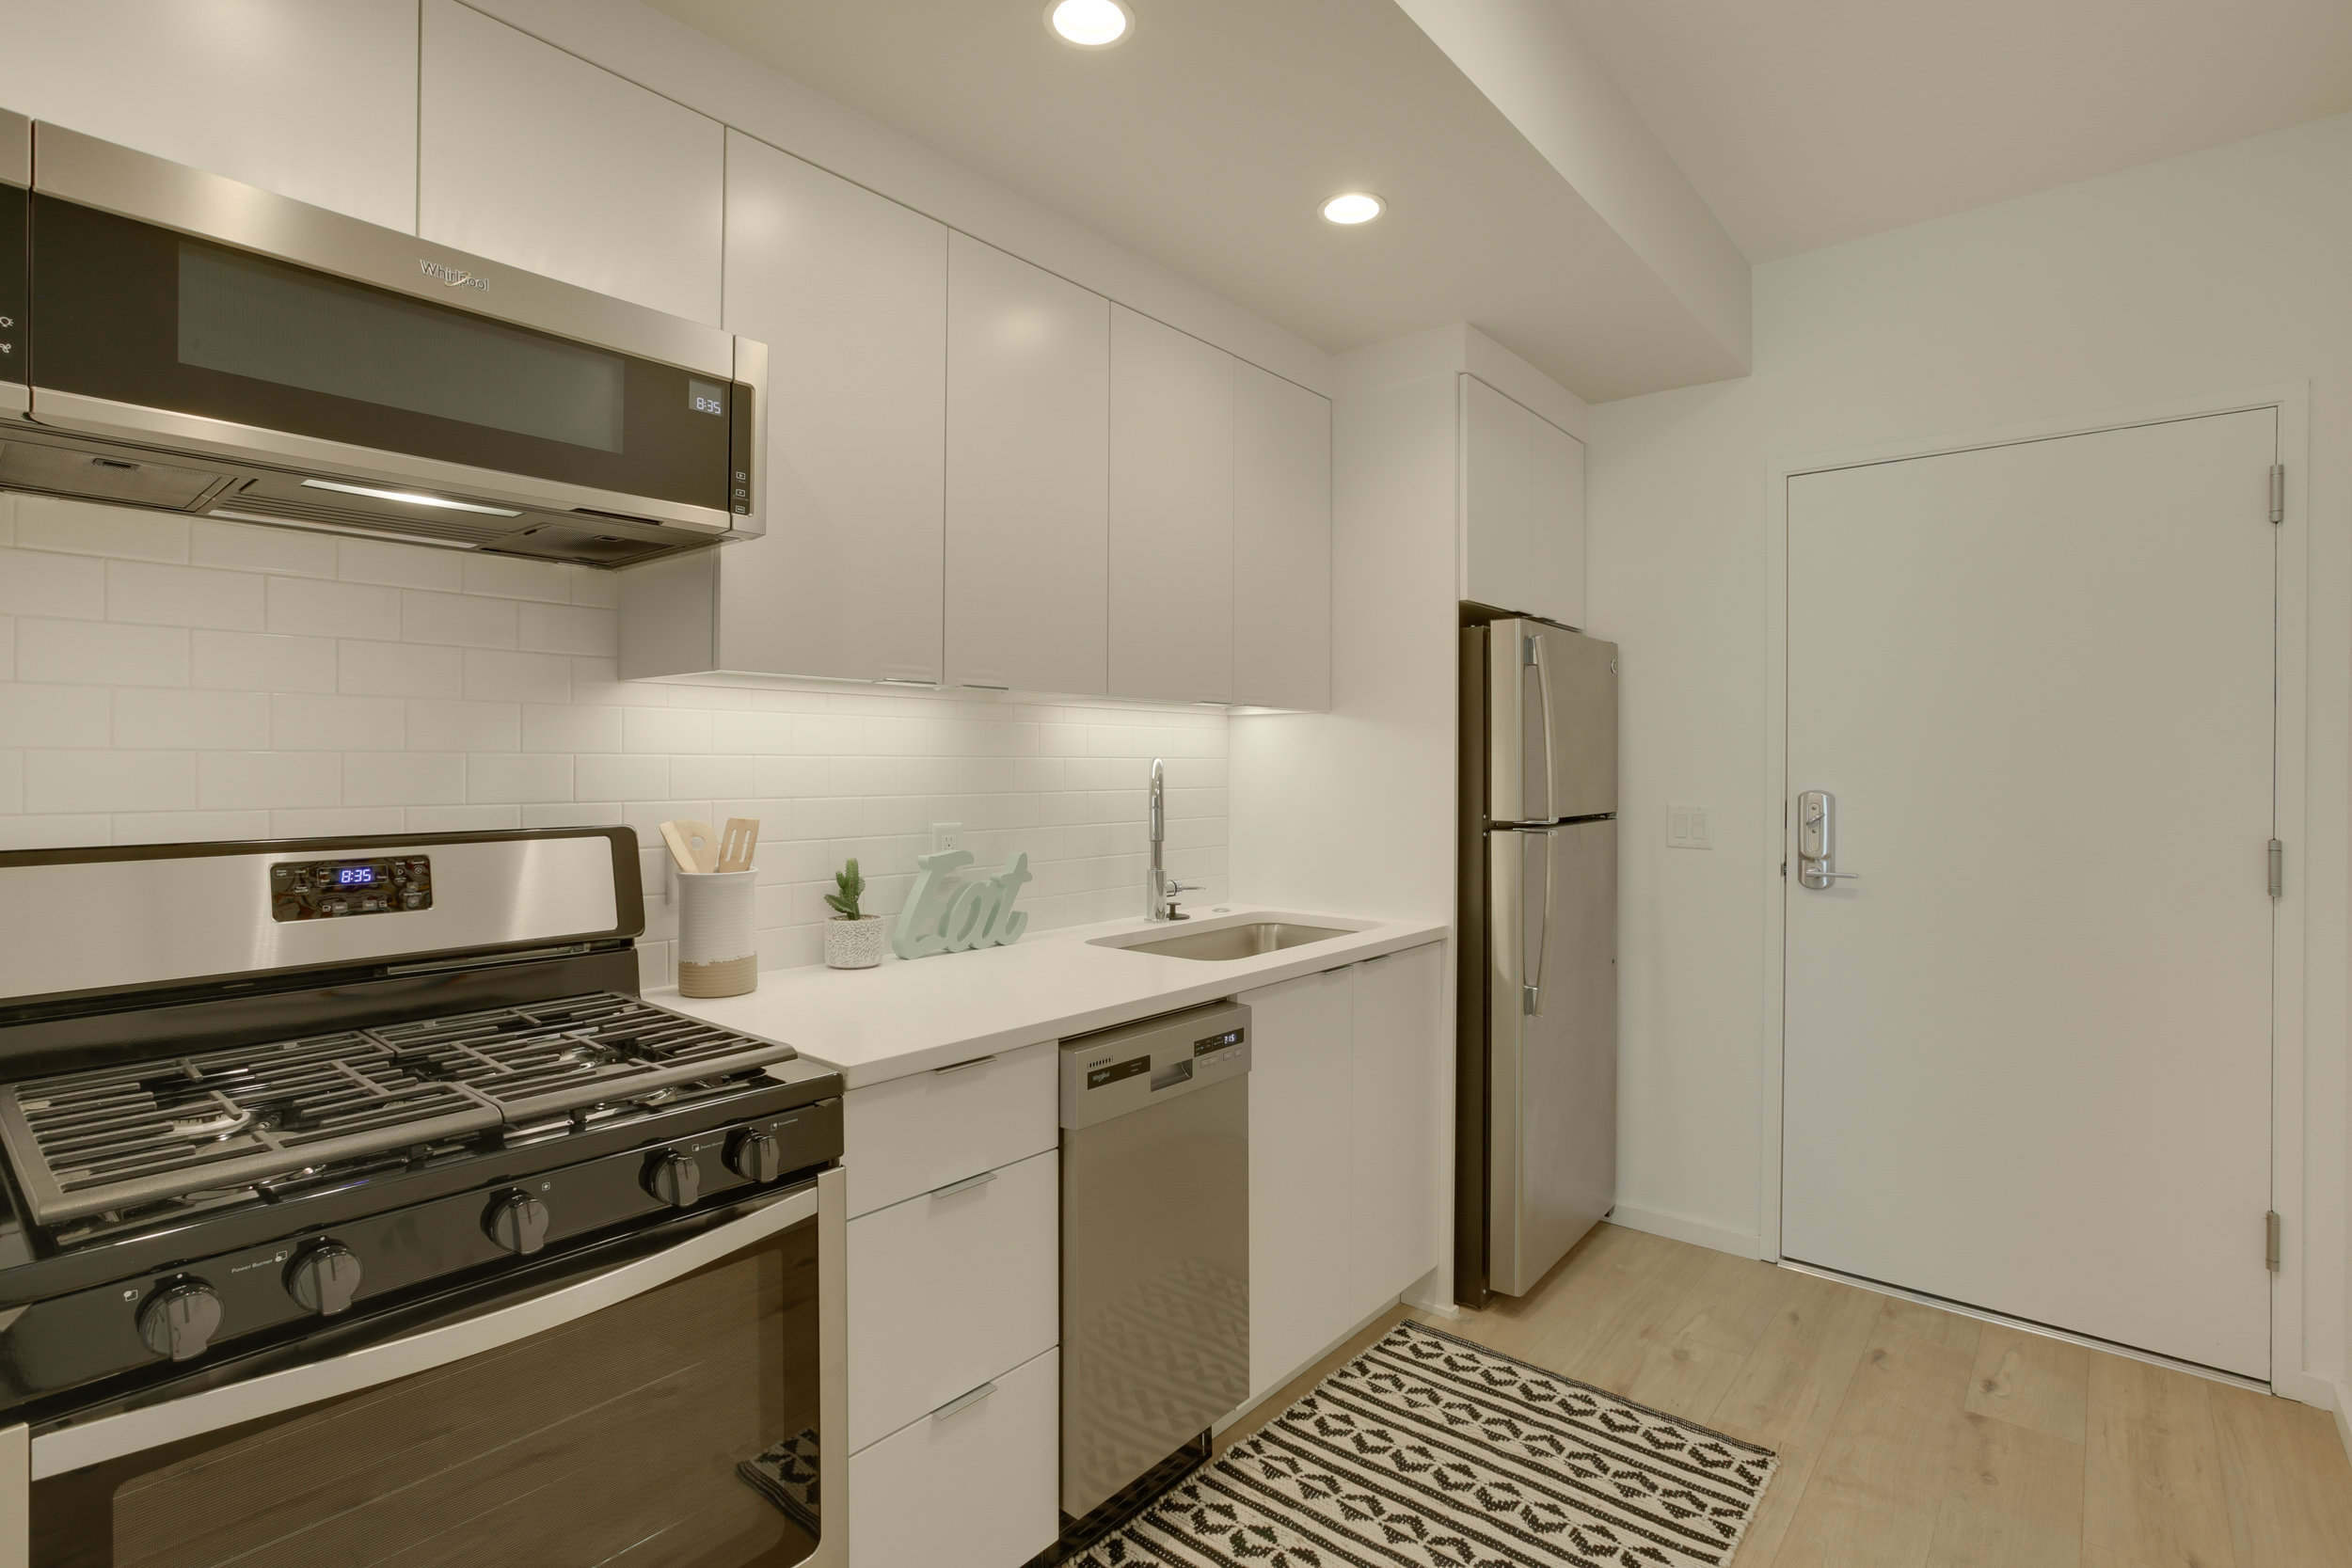 8 kitchen2 unit 304.jpg